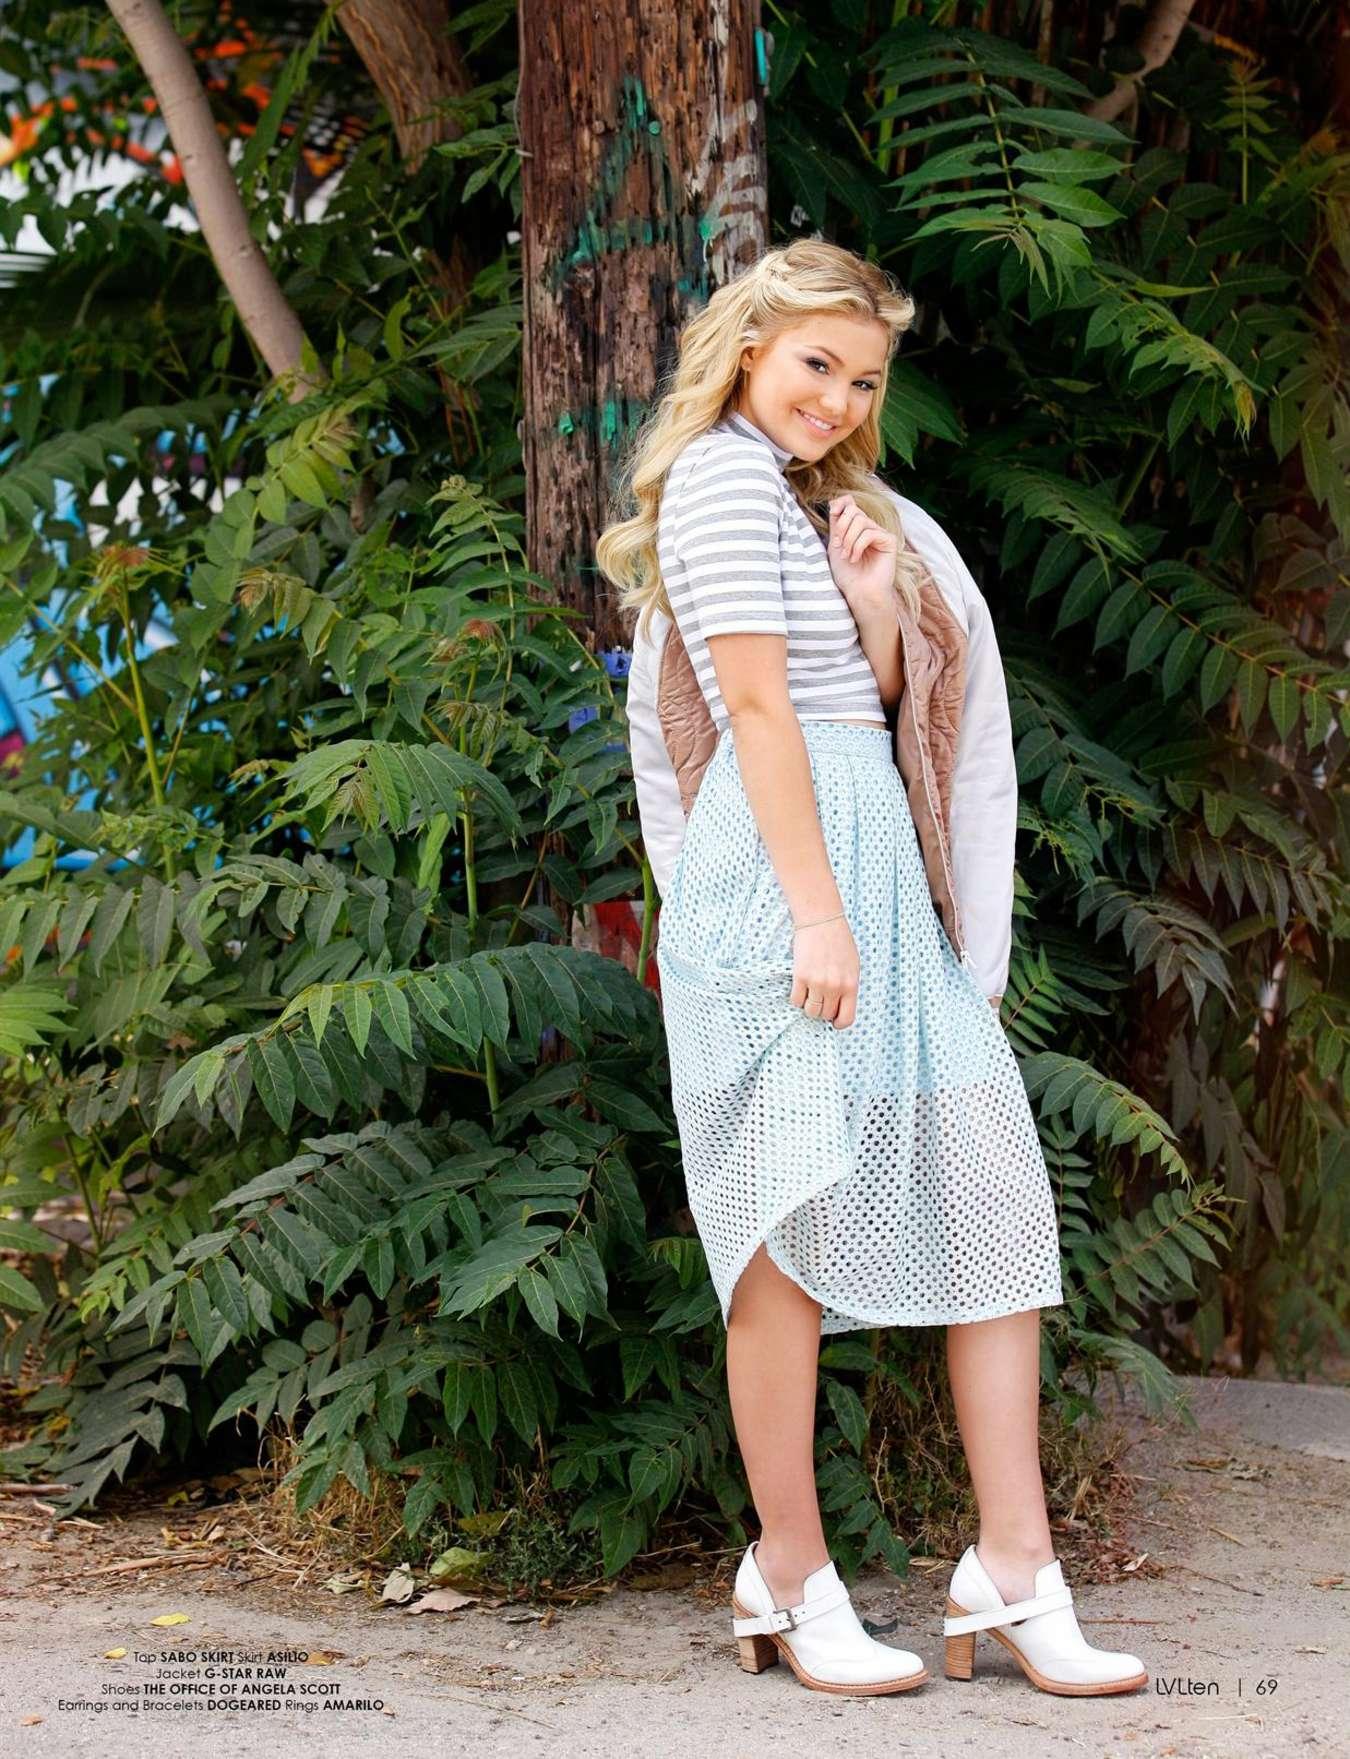 Olivia Holt 2015 : Olivia Holt: LVlten Magazine 2015 -05